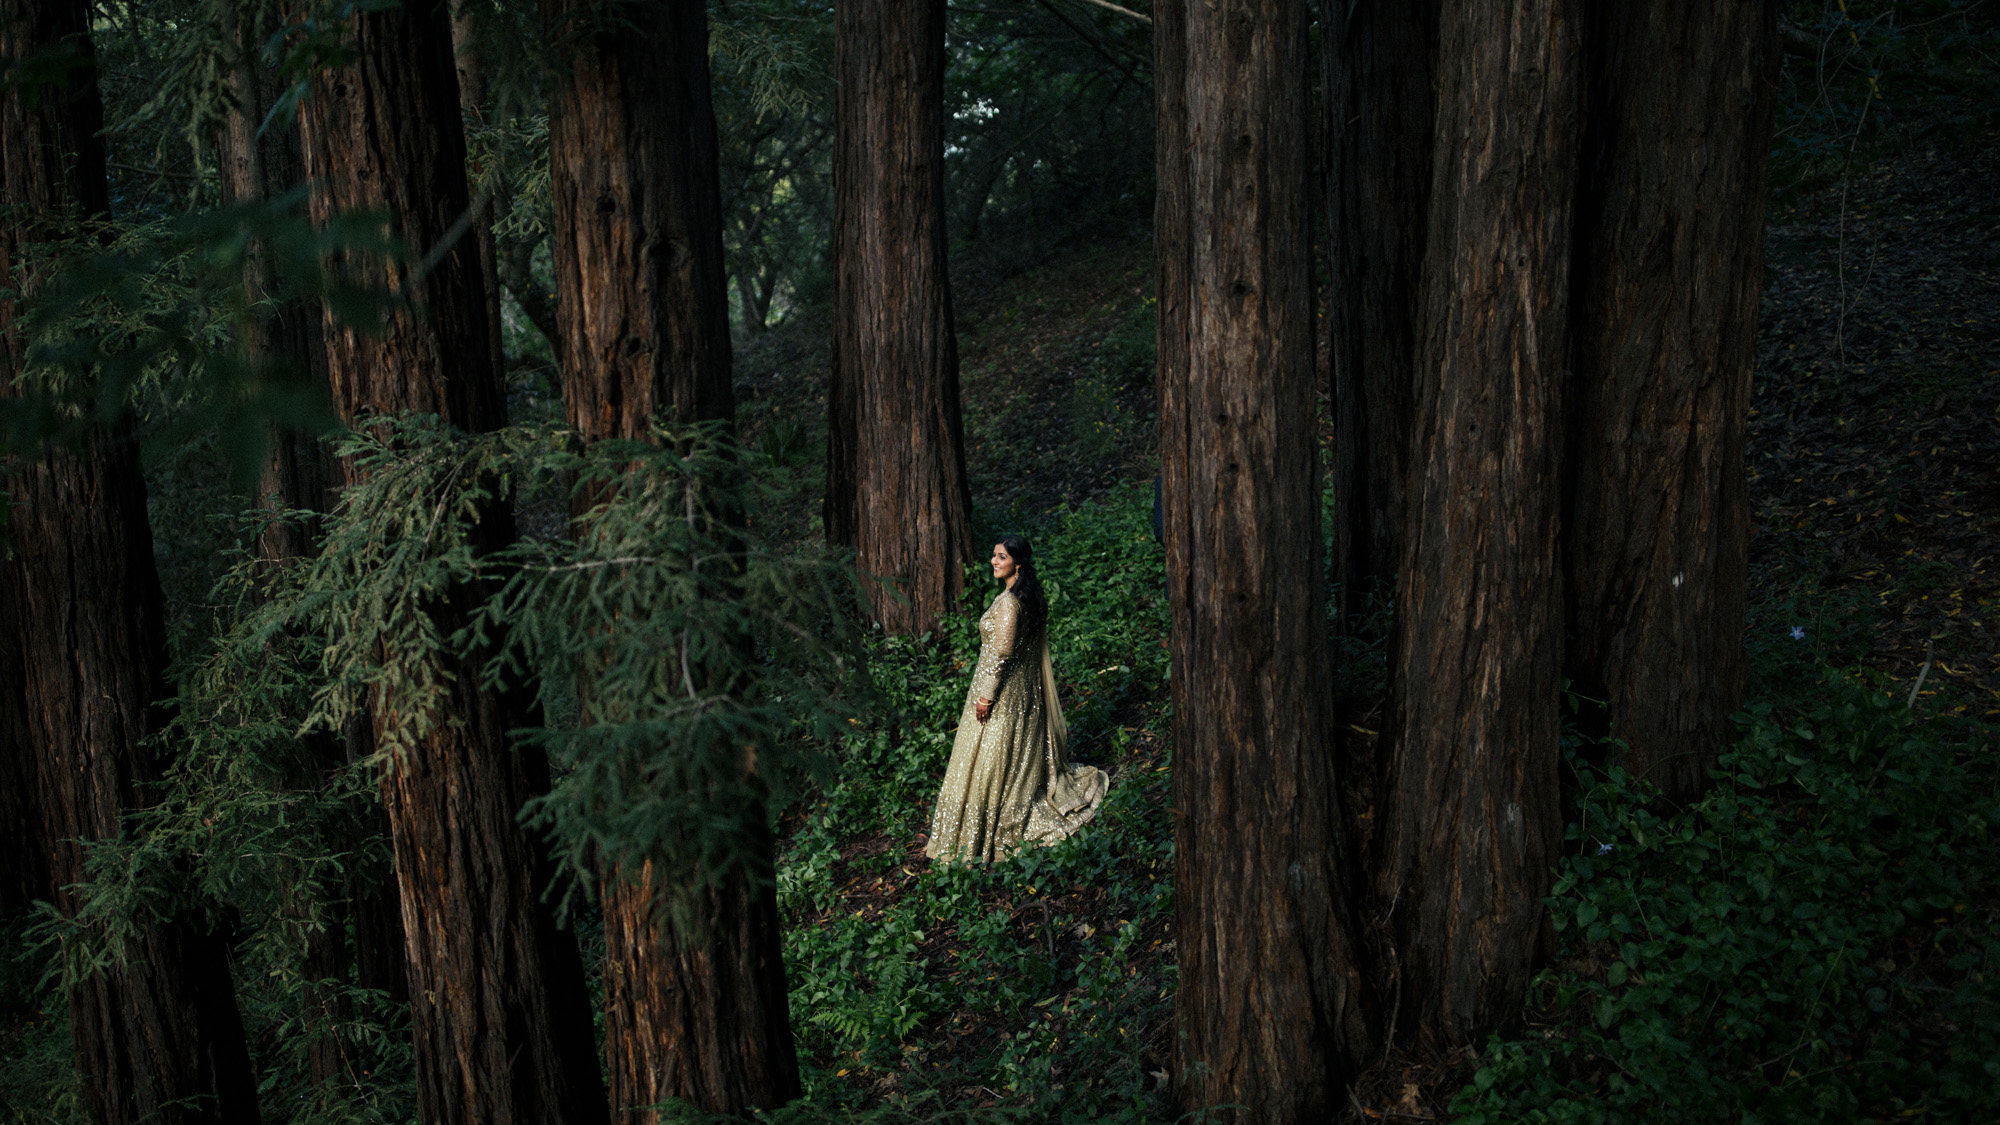 anu_maneesh_alec_vanderboom_Indian_wedding_photography-0148.jpg